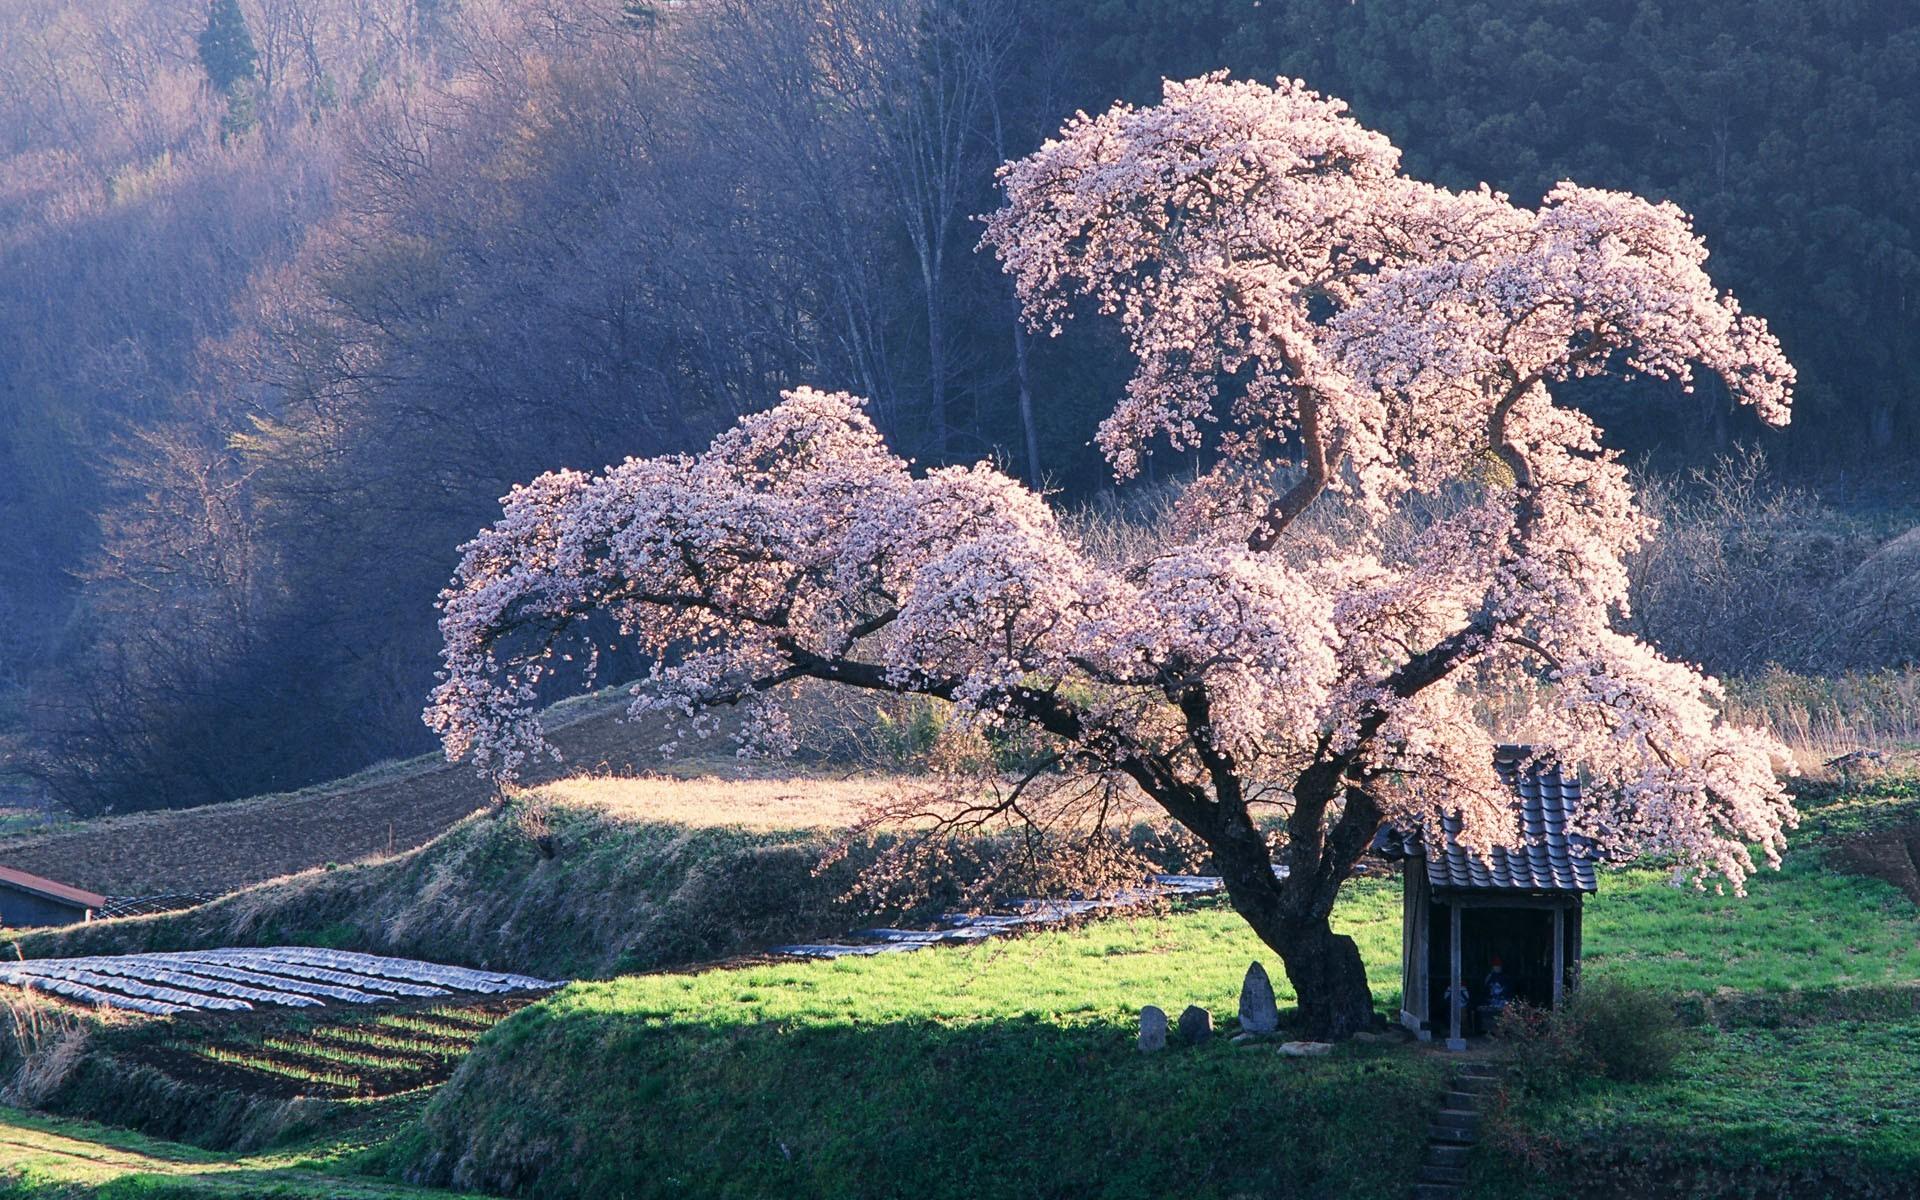 Design Japanese Landscapes japanese landscape wallpaper 1920x1200 japan landscapes nature cherry blossoms trees grass fields rice